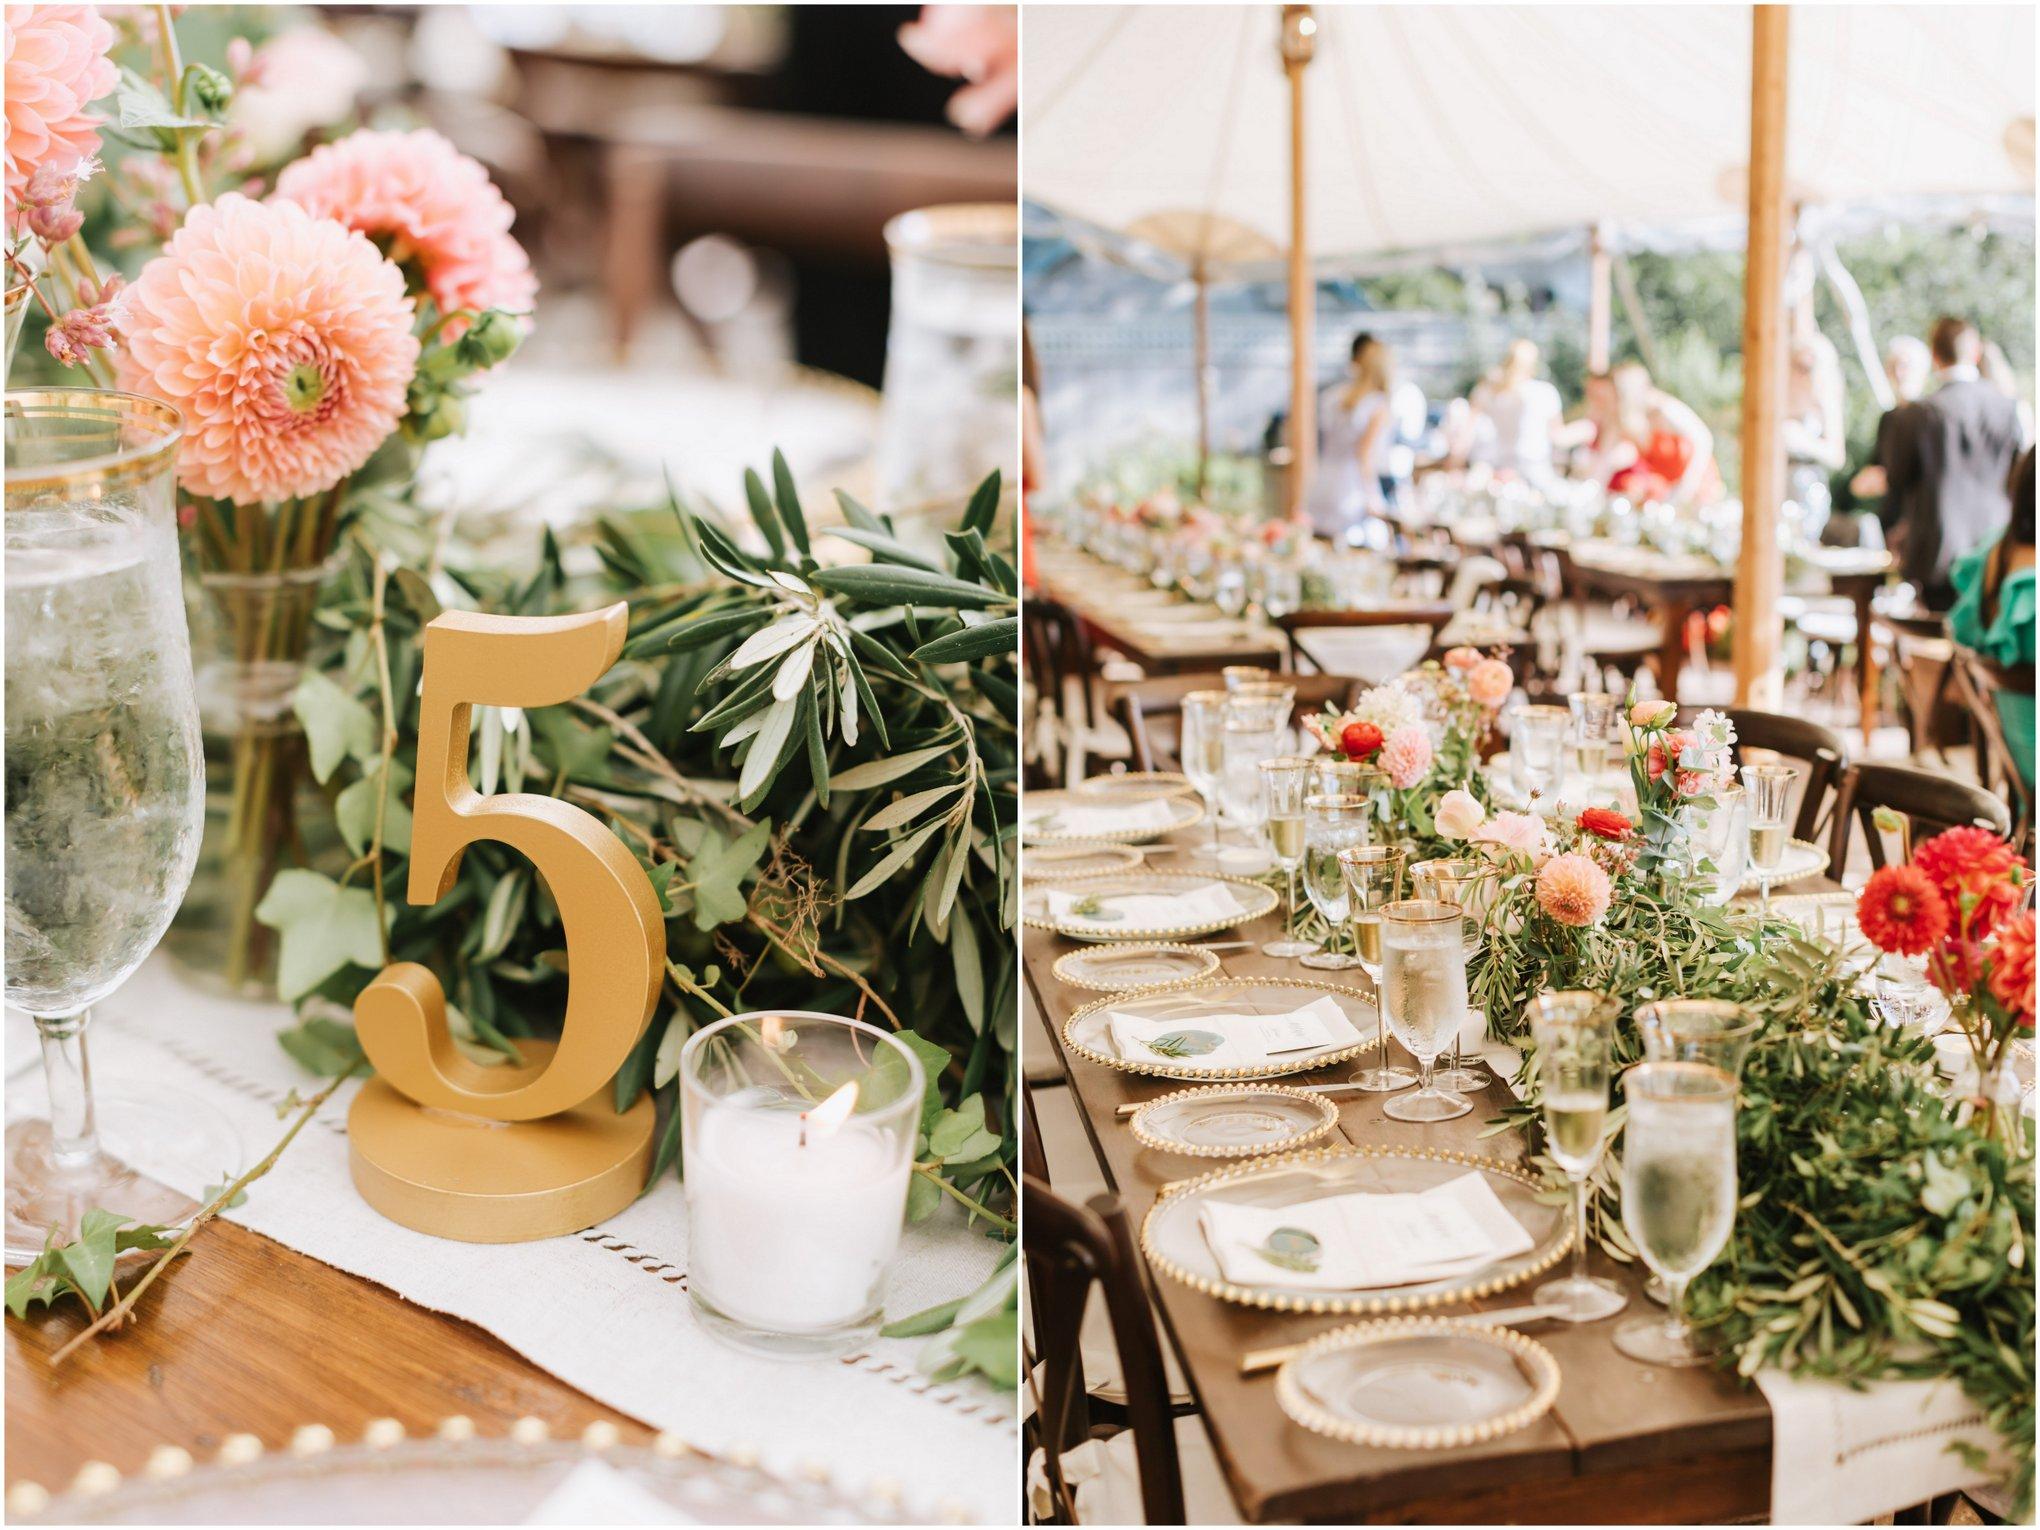 Marthas-Vineyard-Wedding-Photographer-Beach-Plum-Inn-30.jpg